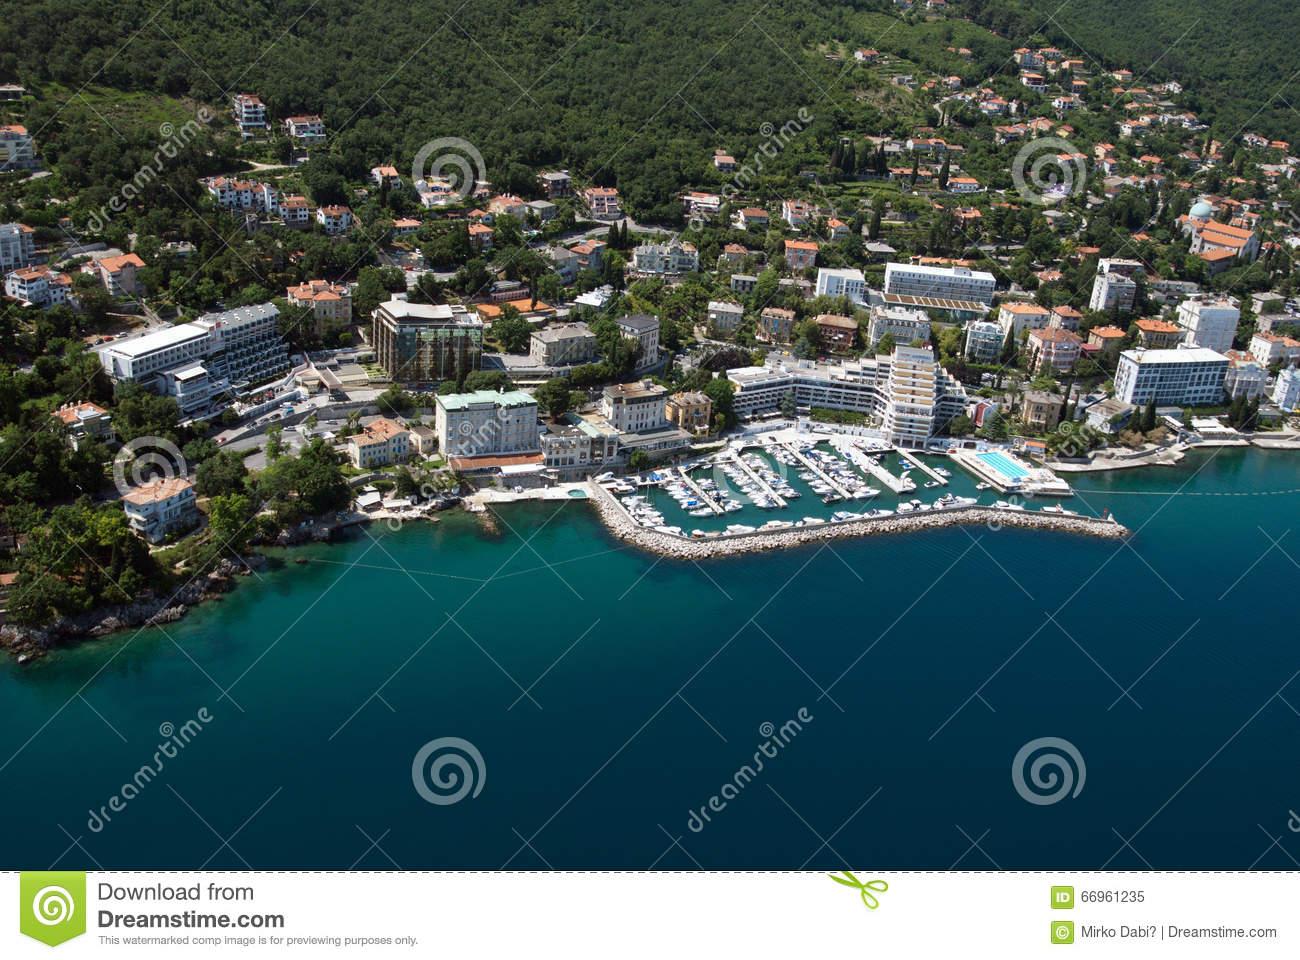 Air Photo Of Opatija On Adriatic Sea In Croatia With Hotel Admiral.